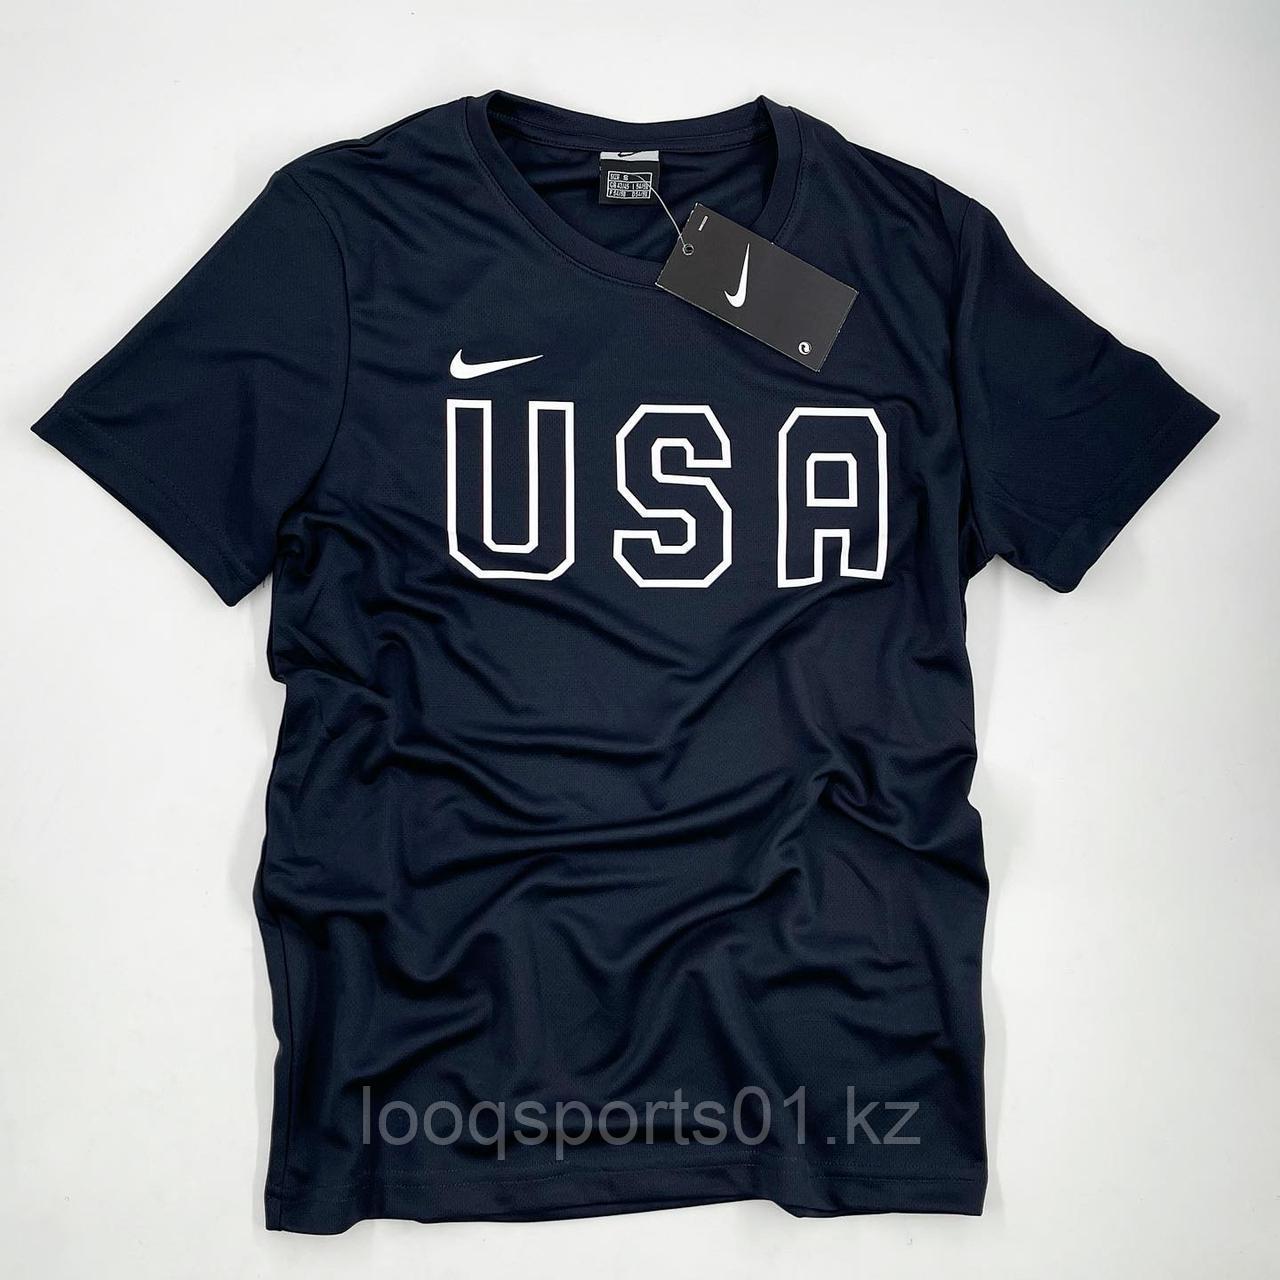 Спортивная футболка мужская Nike USA